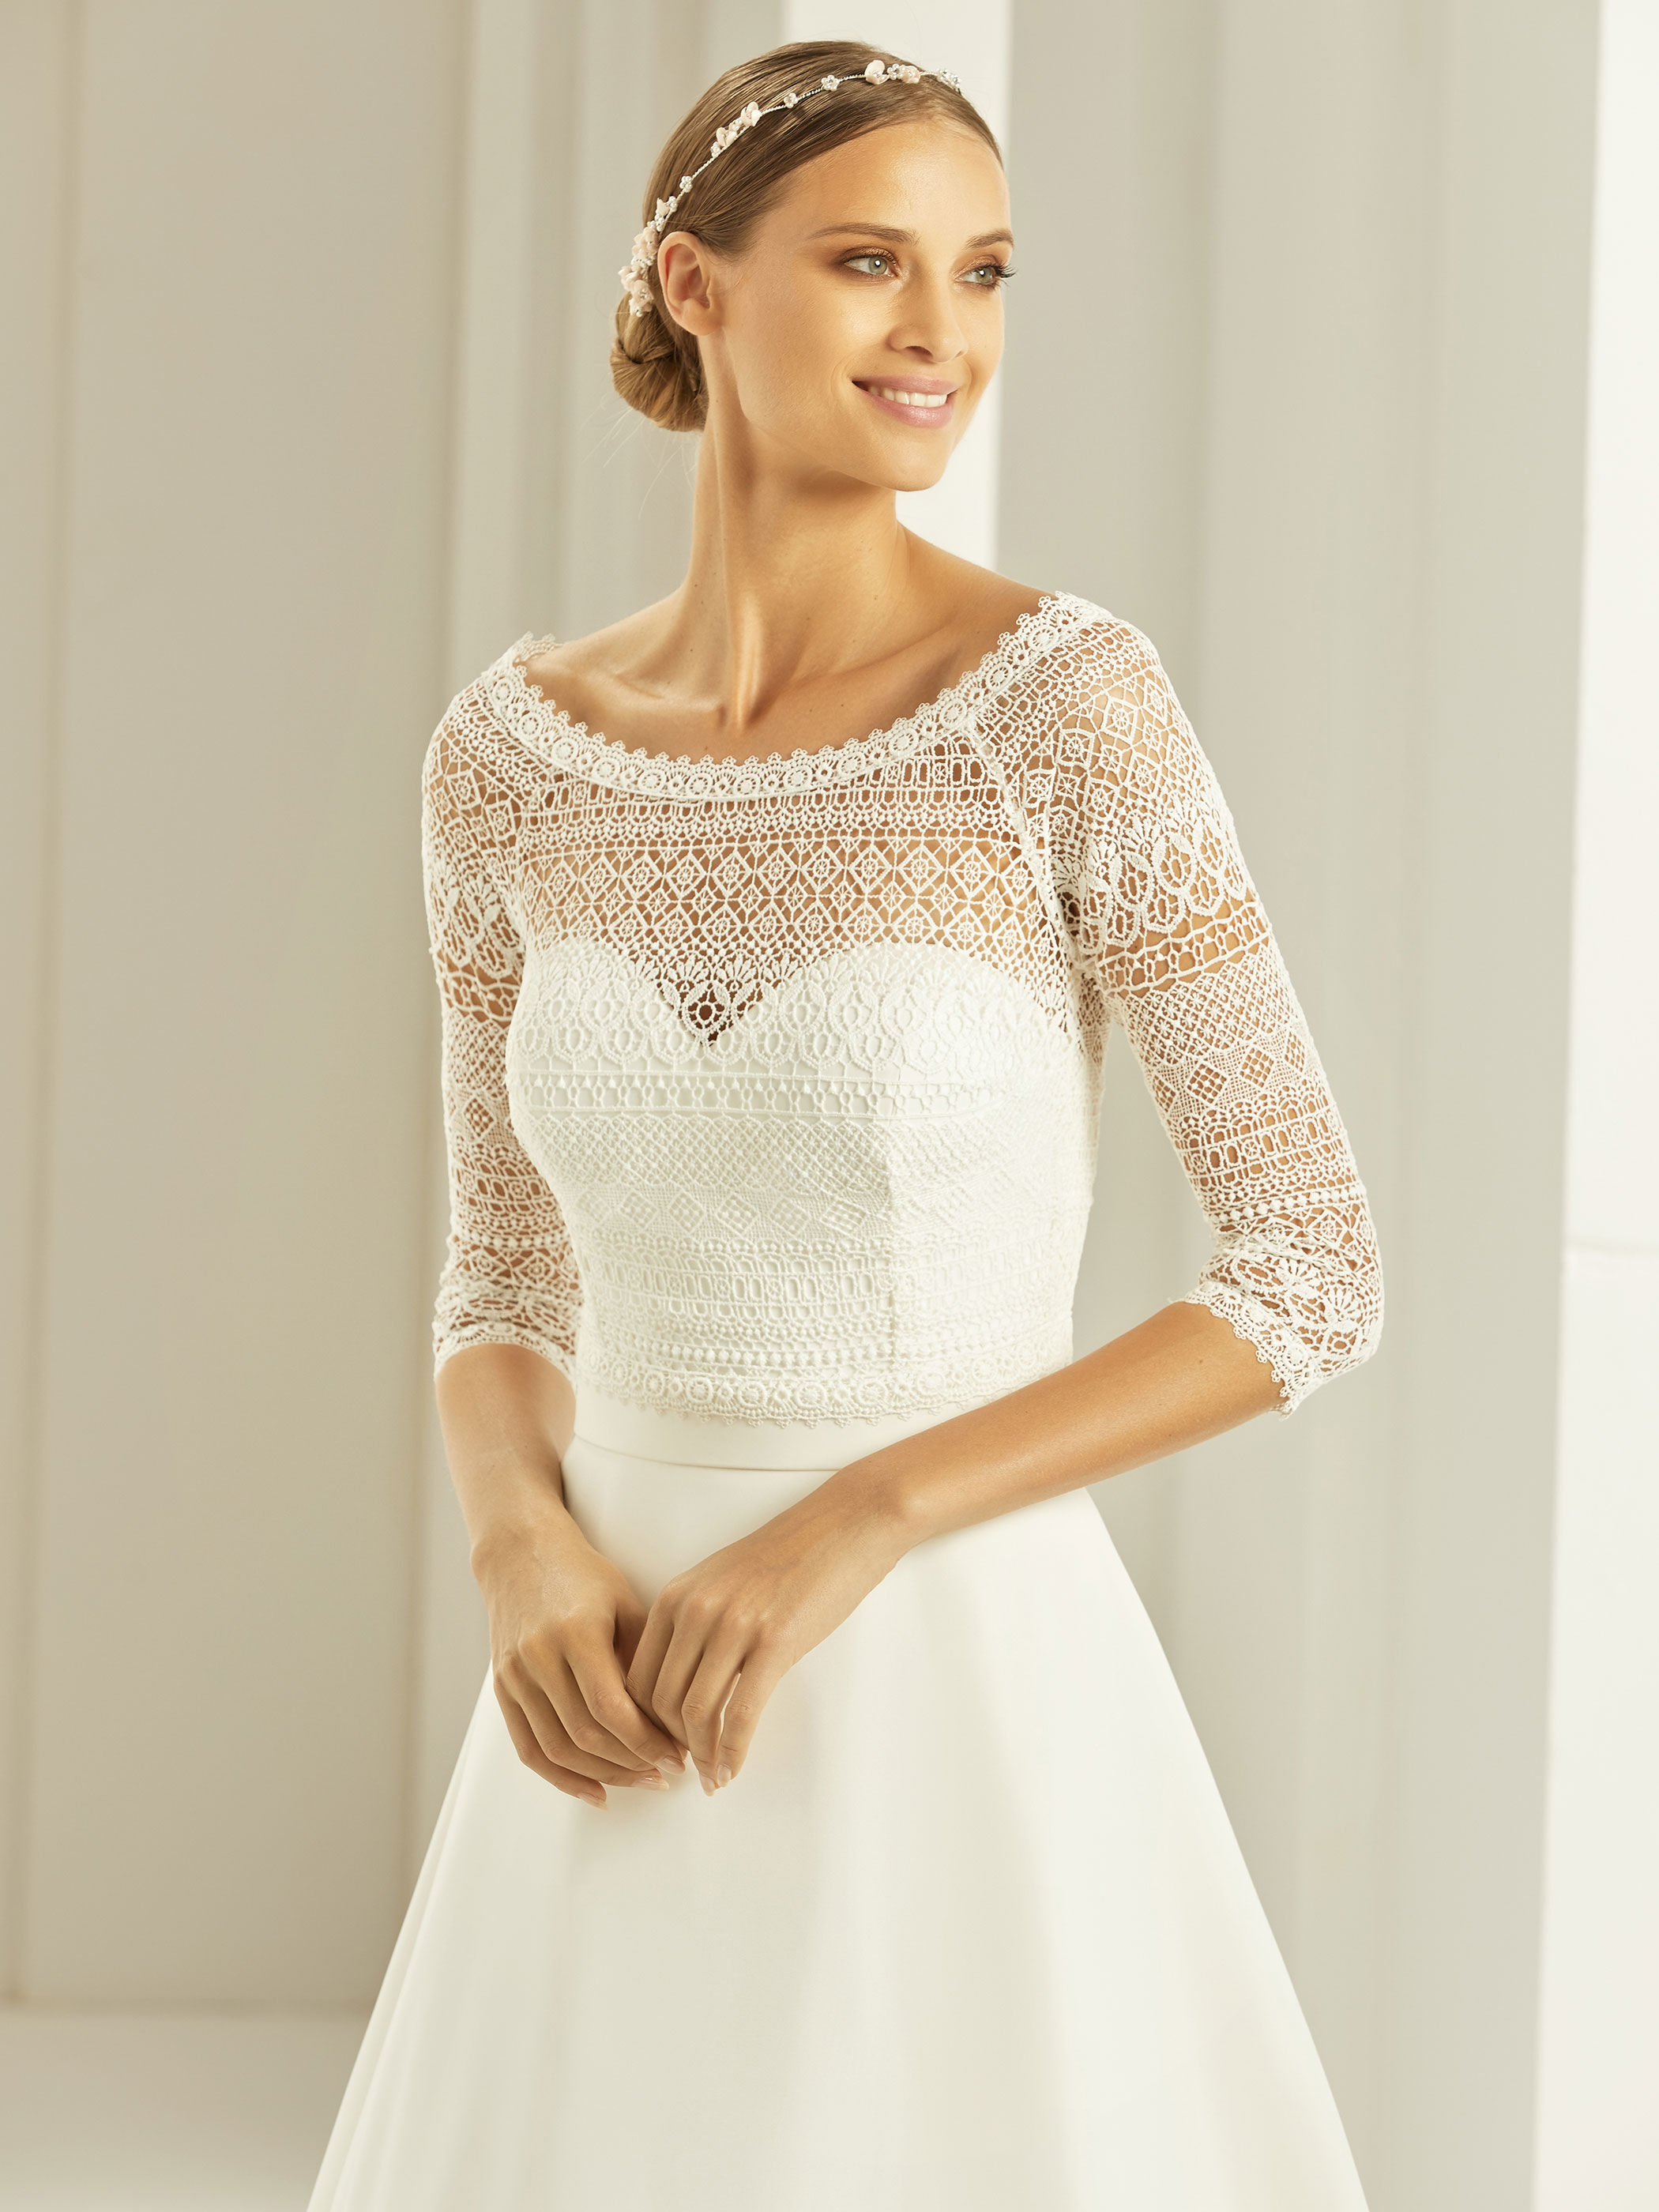 bianco-evento-bridal-bolero-e280-_1__2.j